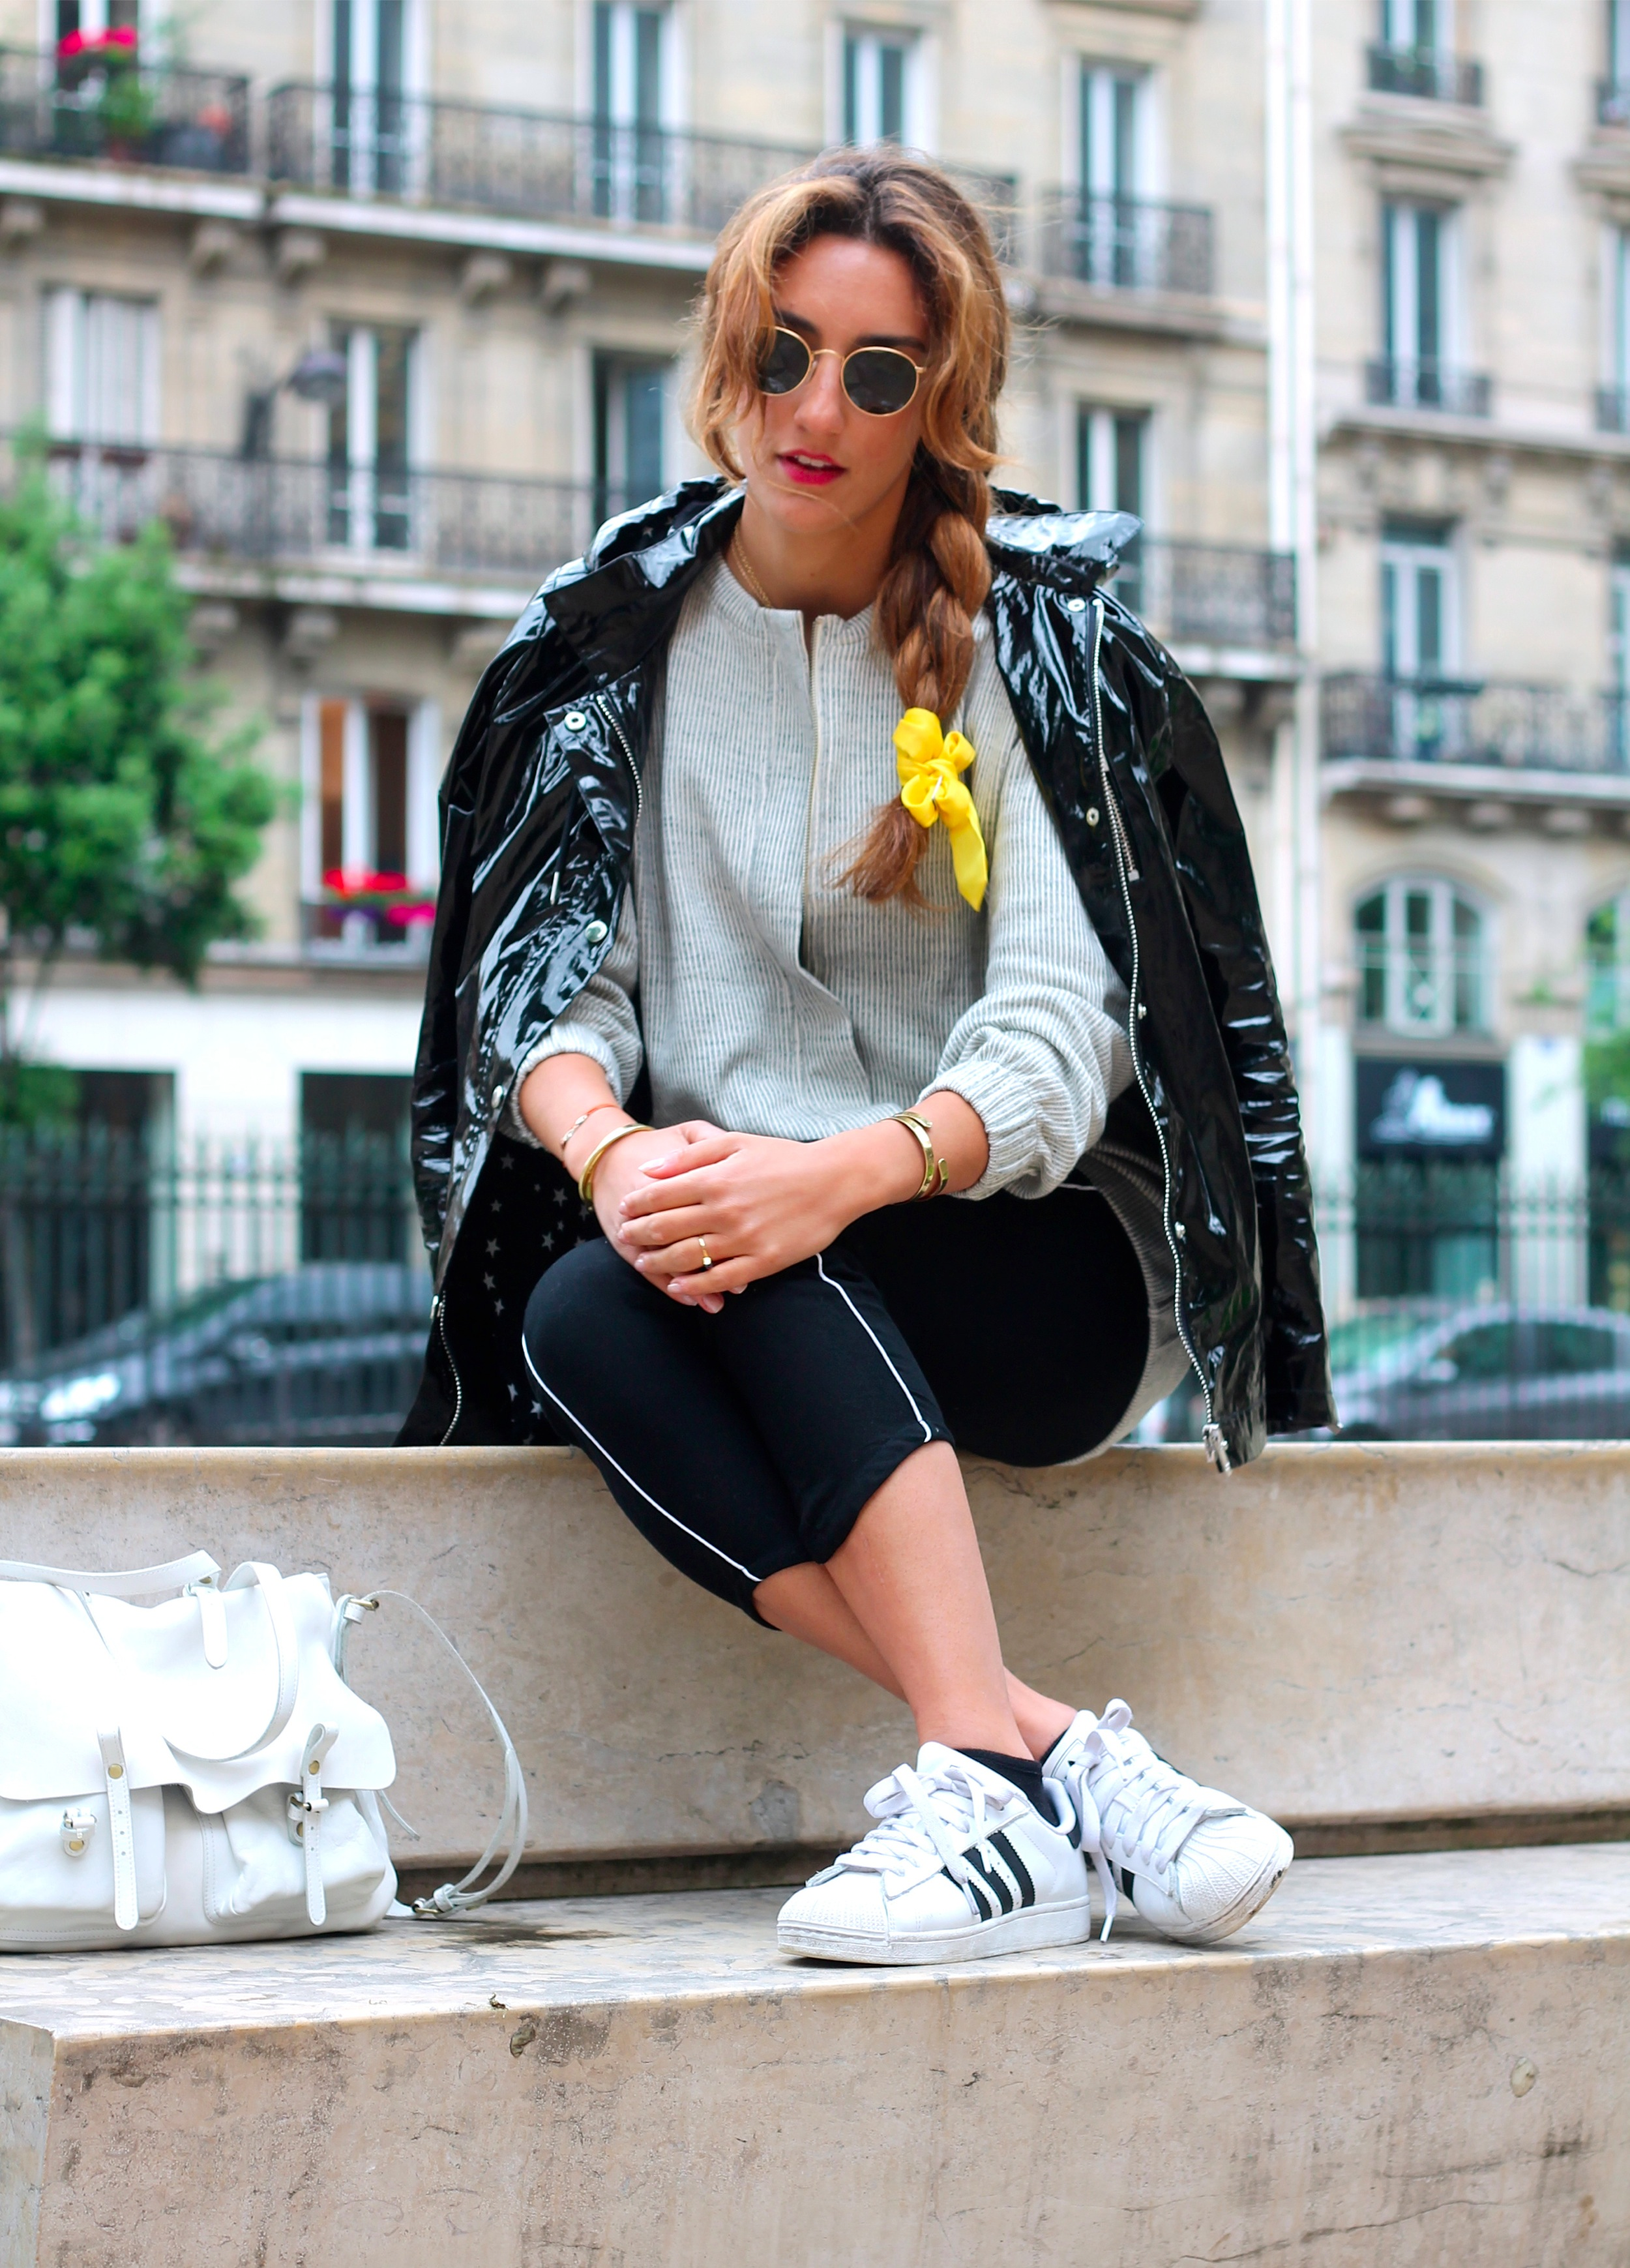 Adidas Superstar 2 Femme Porté